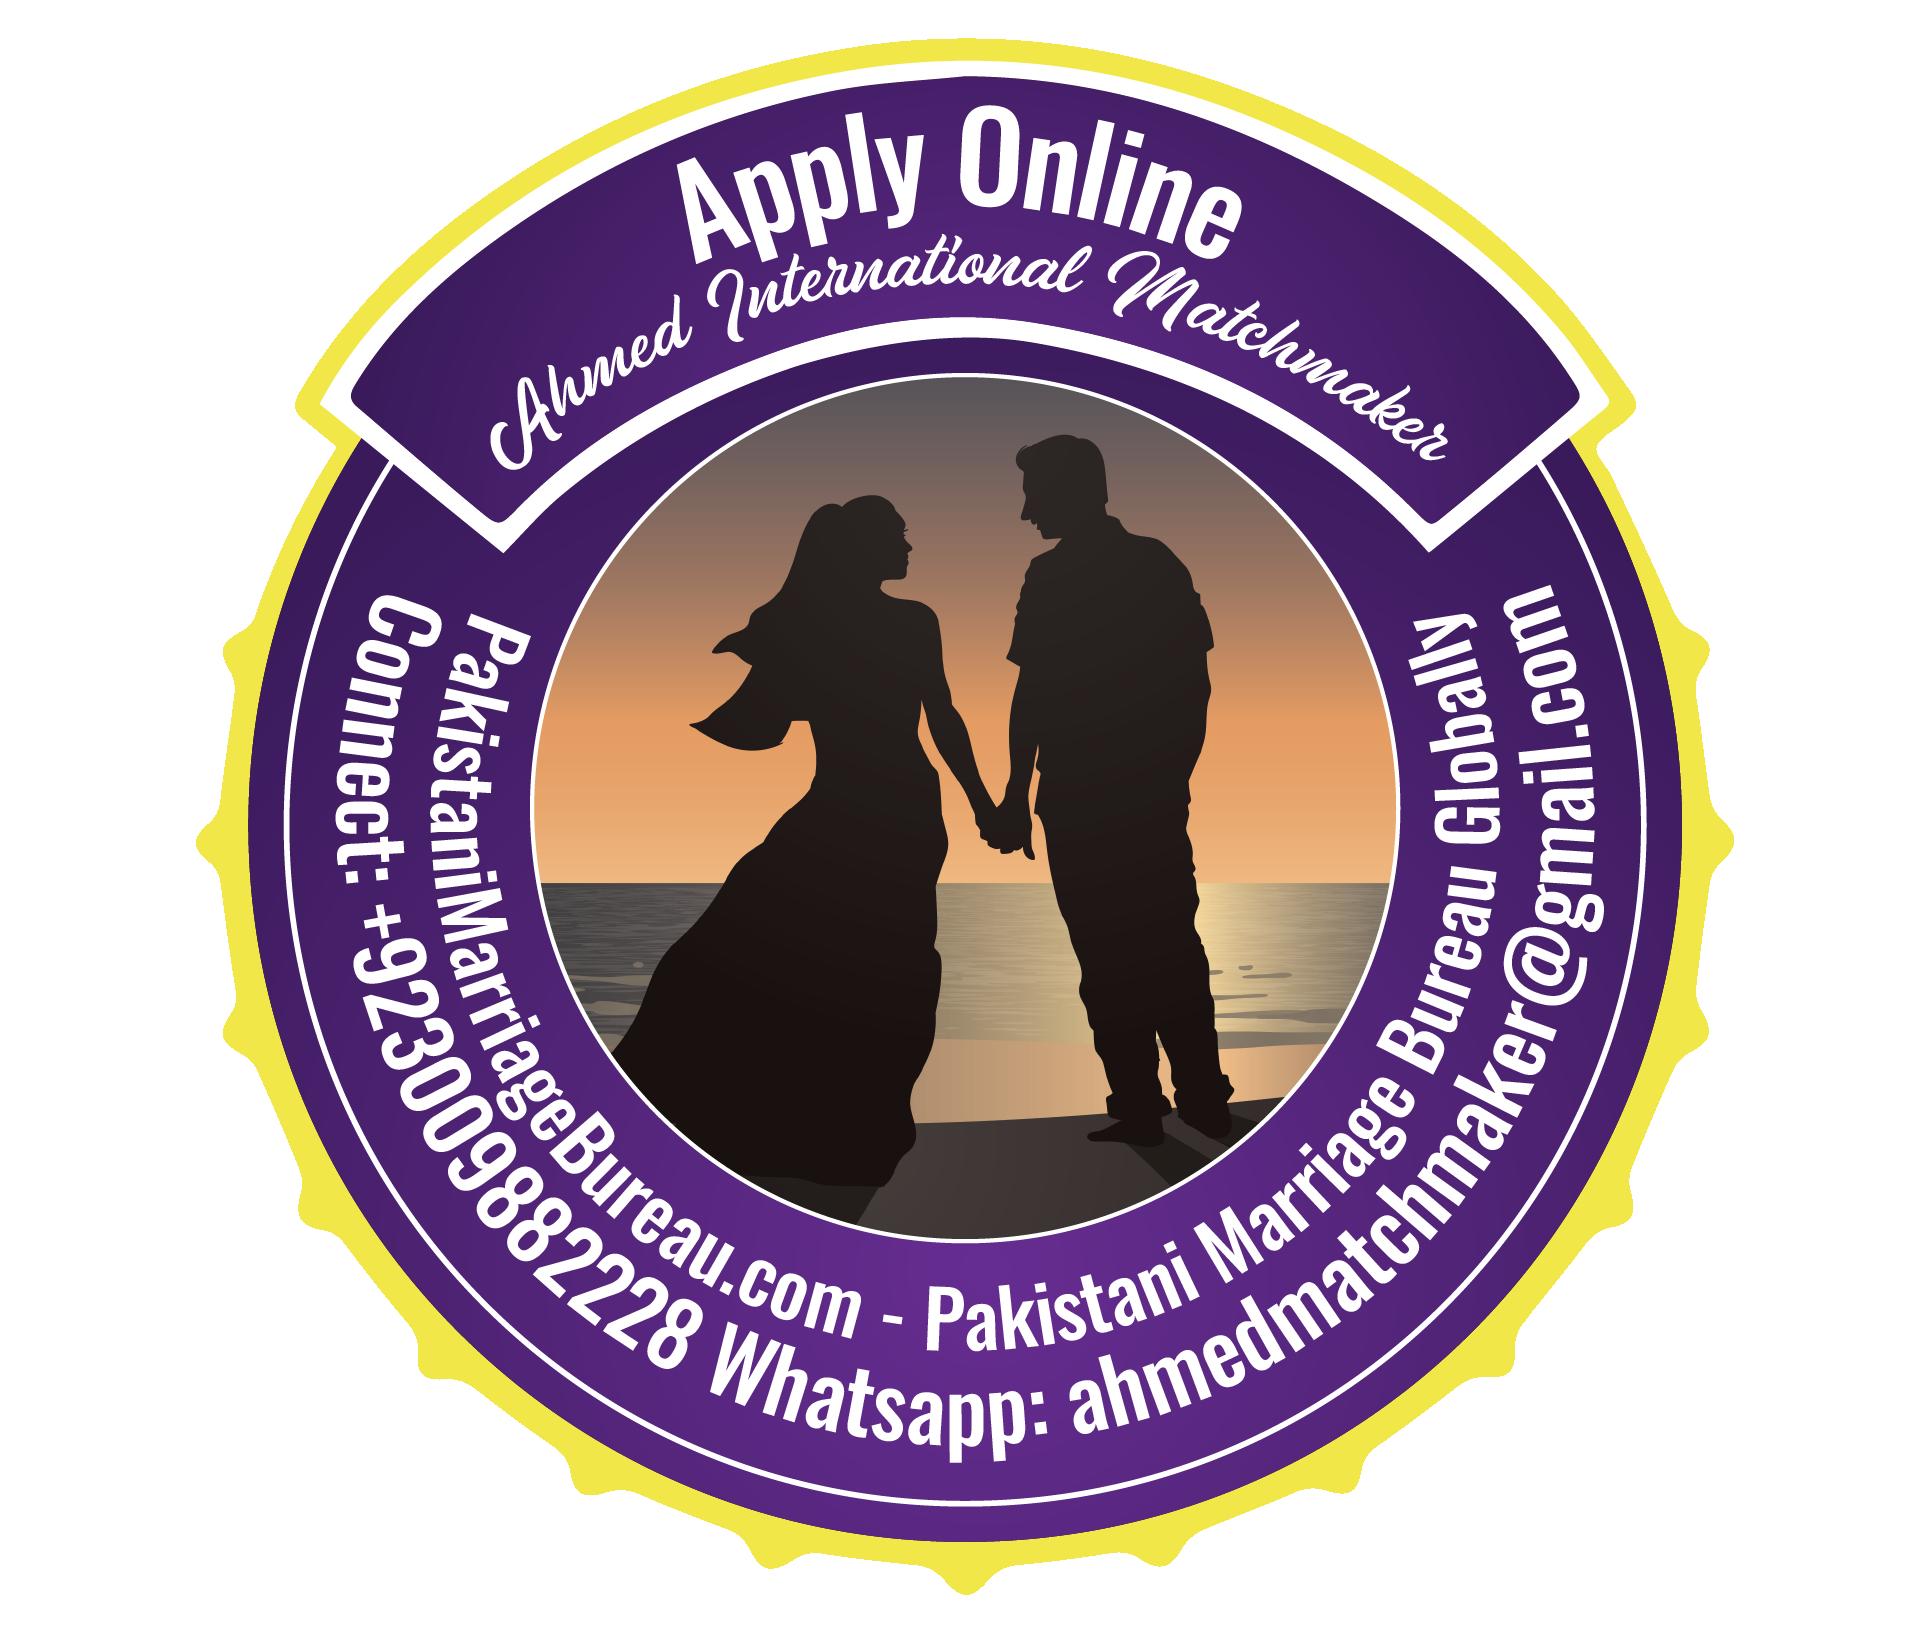 Pakistan for widows in looking marriage Pakistan Rishta